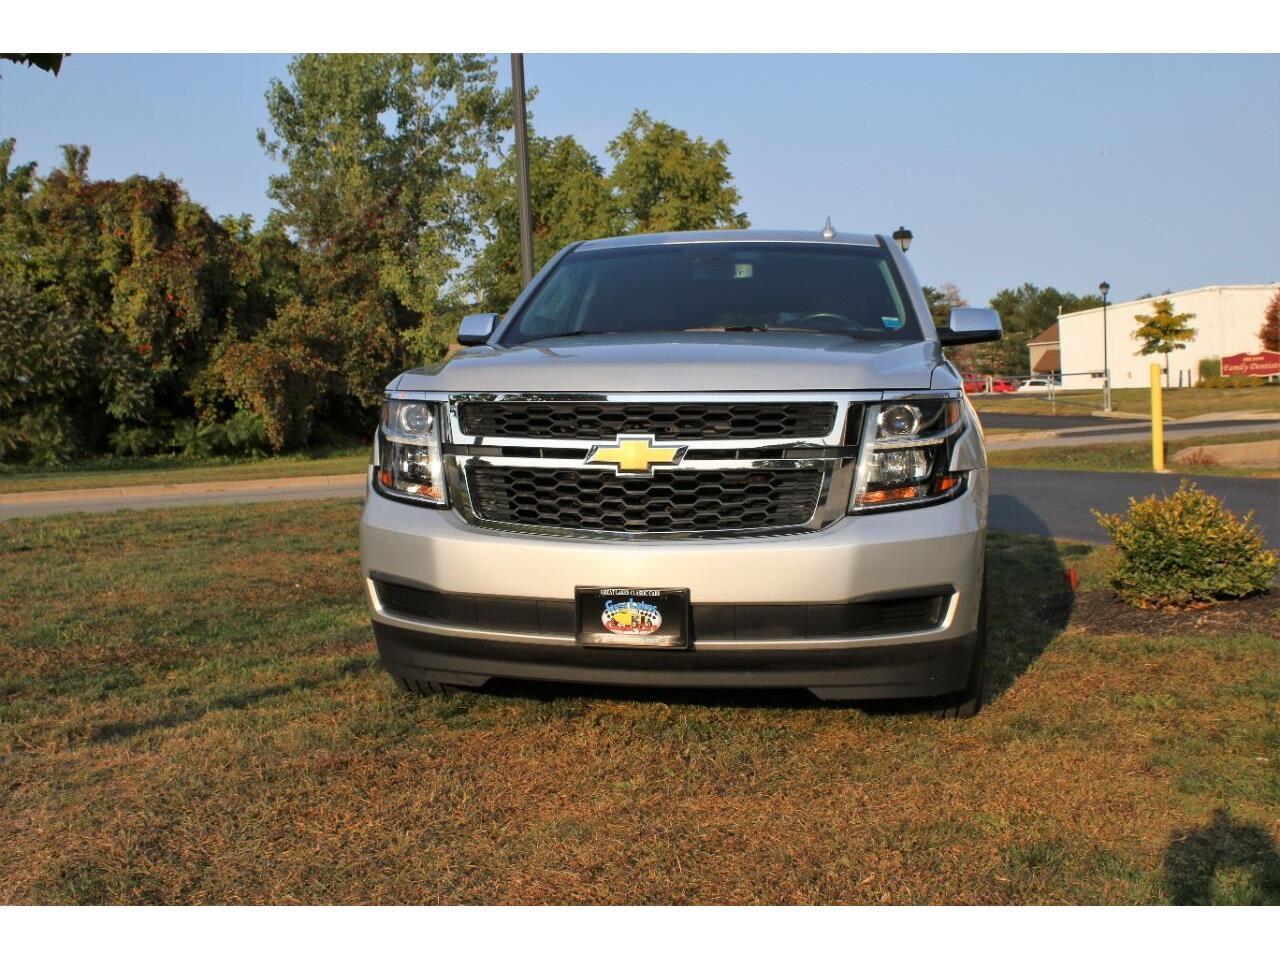 2016 Chevrolet Suburban (CC-1392831) for sale in Hilton, New York